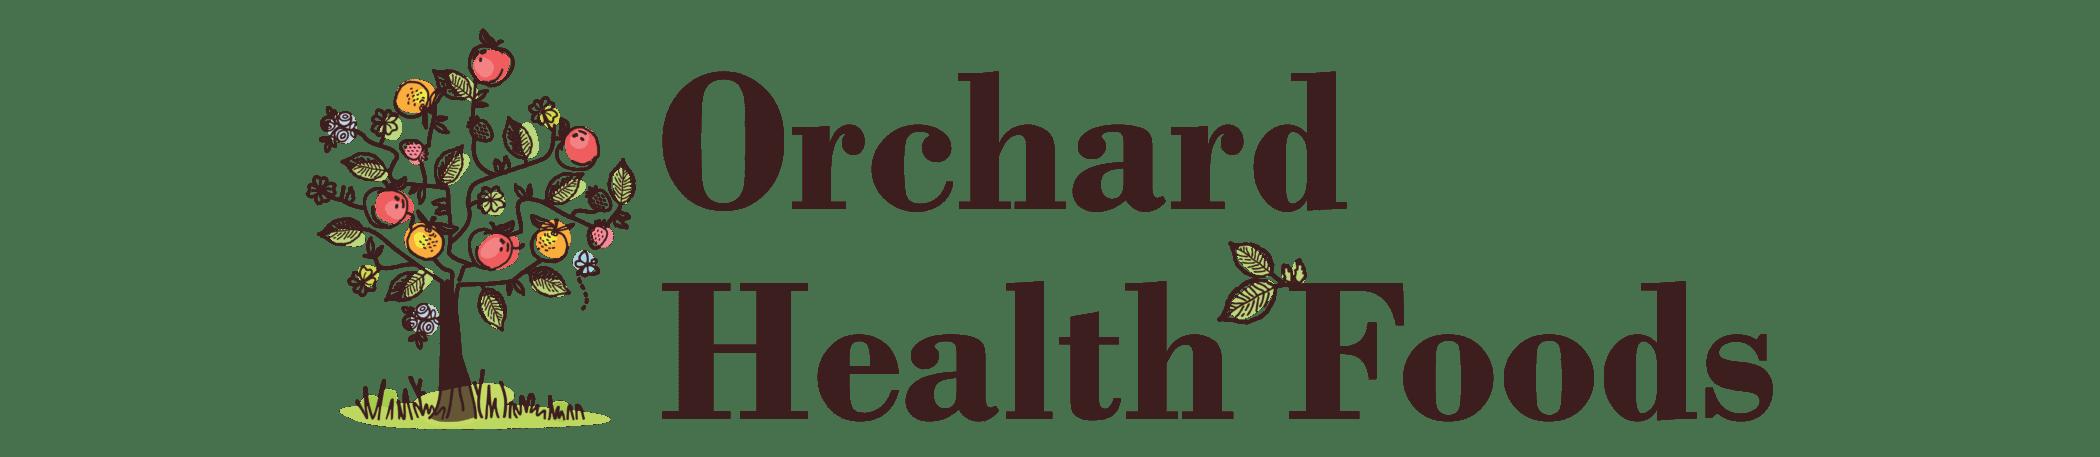 Orchard Health Foods Logo